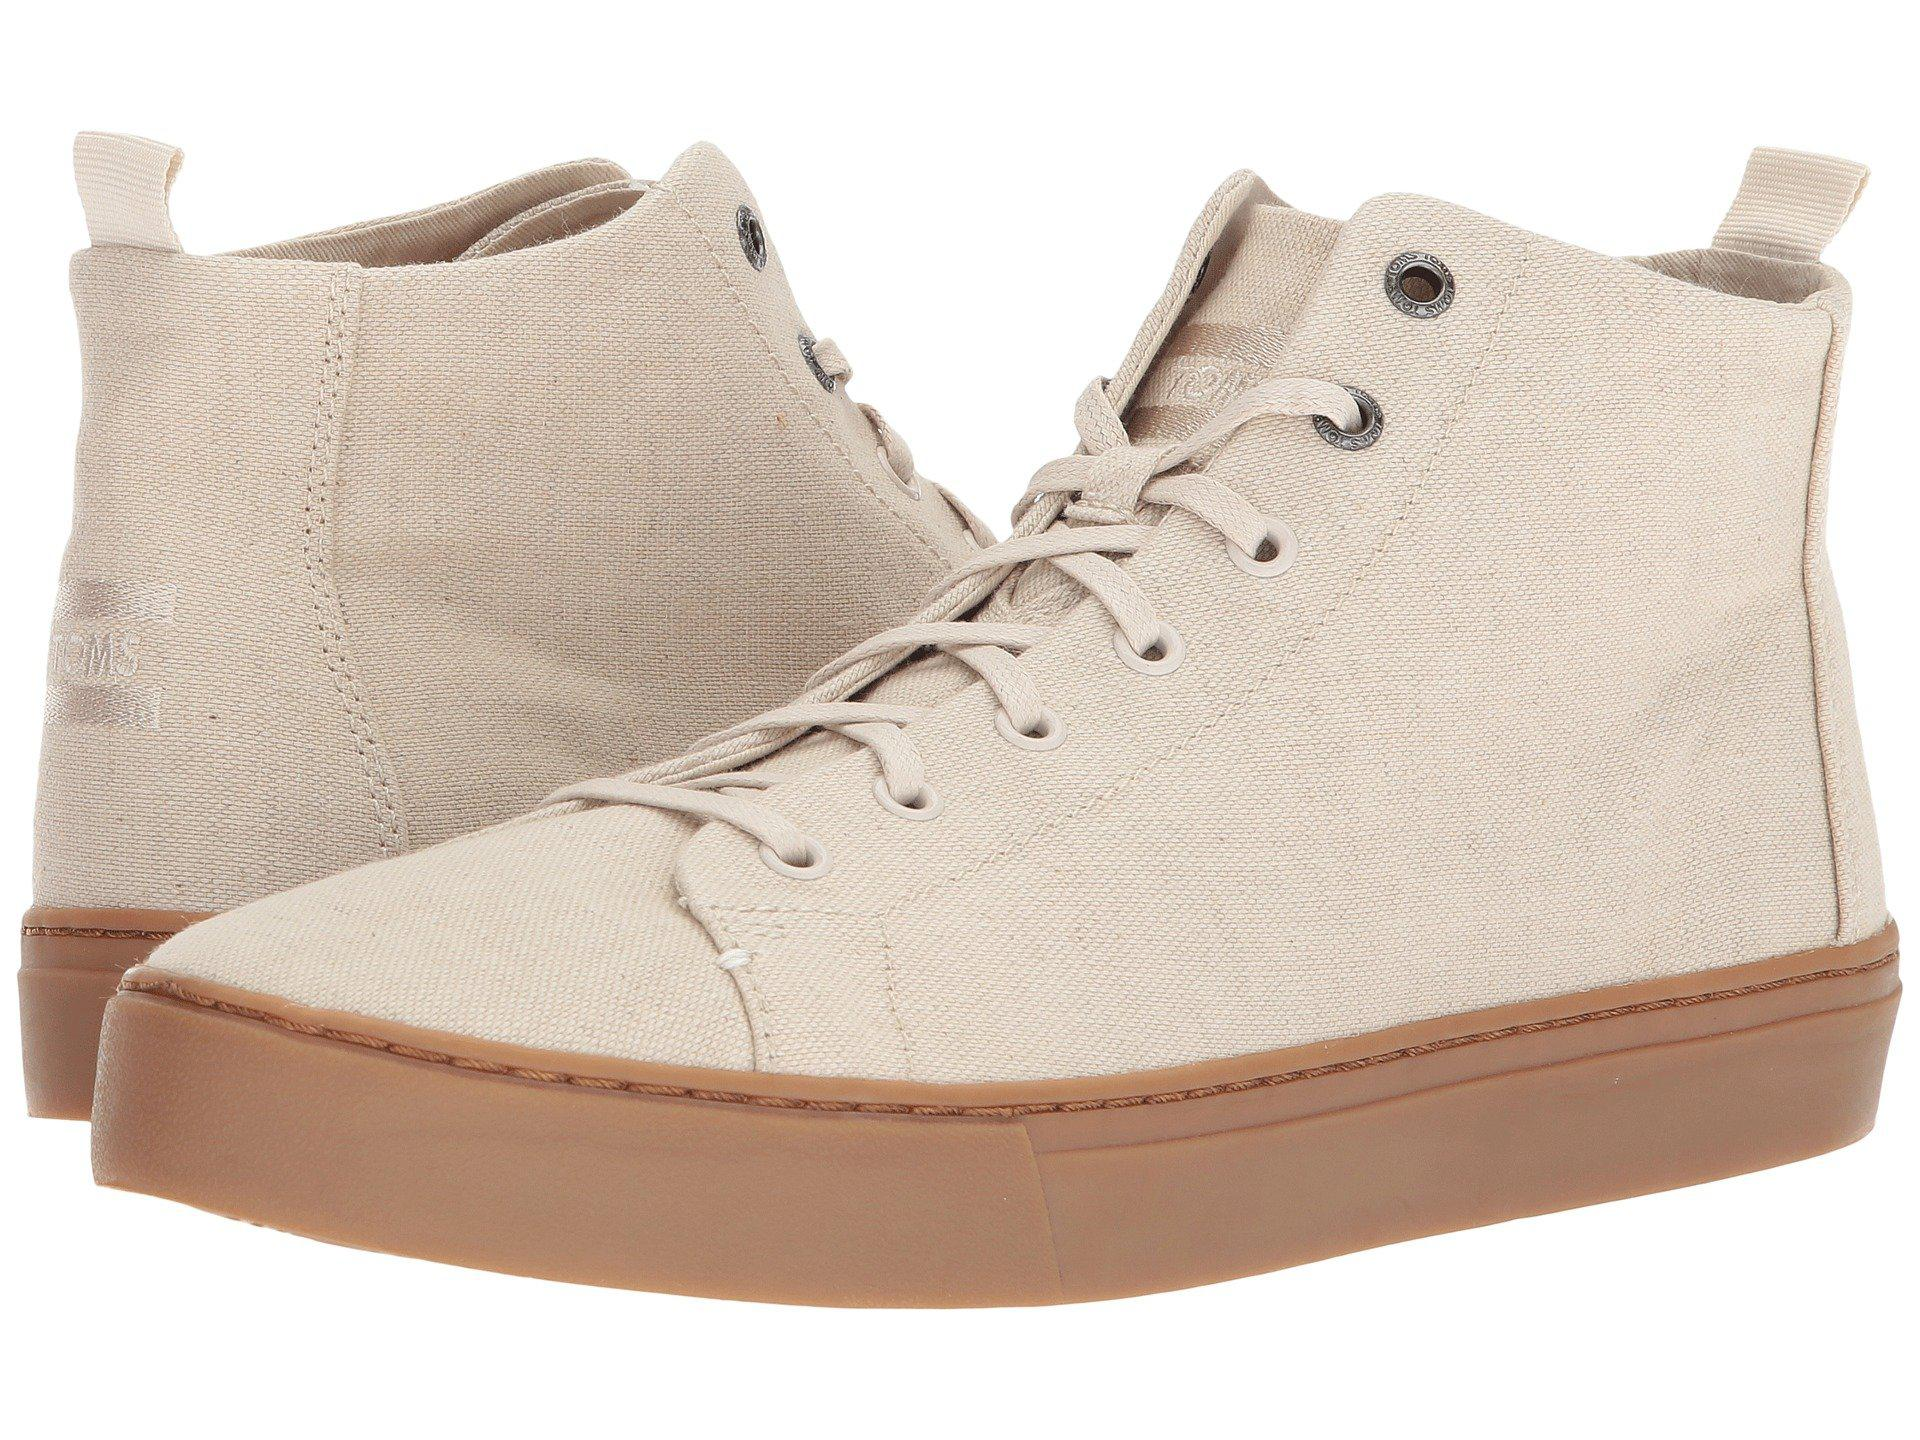 Niedriger Preis LENOX MID - Sneaker low - natural Auslass Für Schön Billiger Preis ozBxS